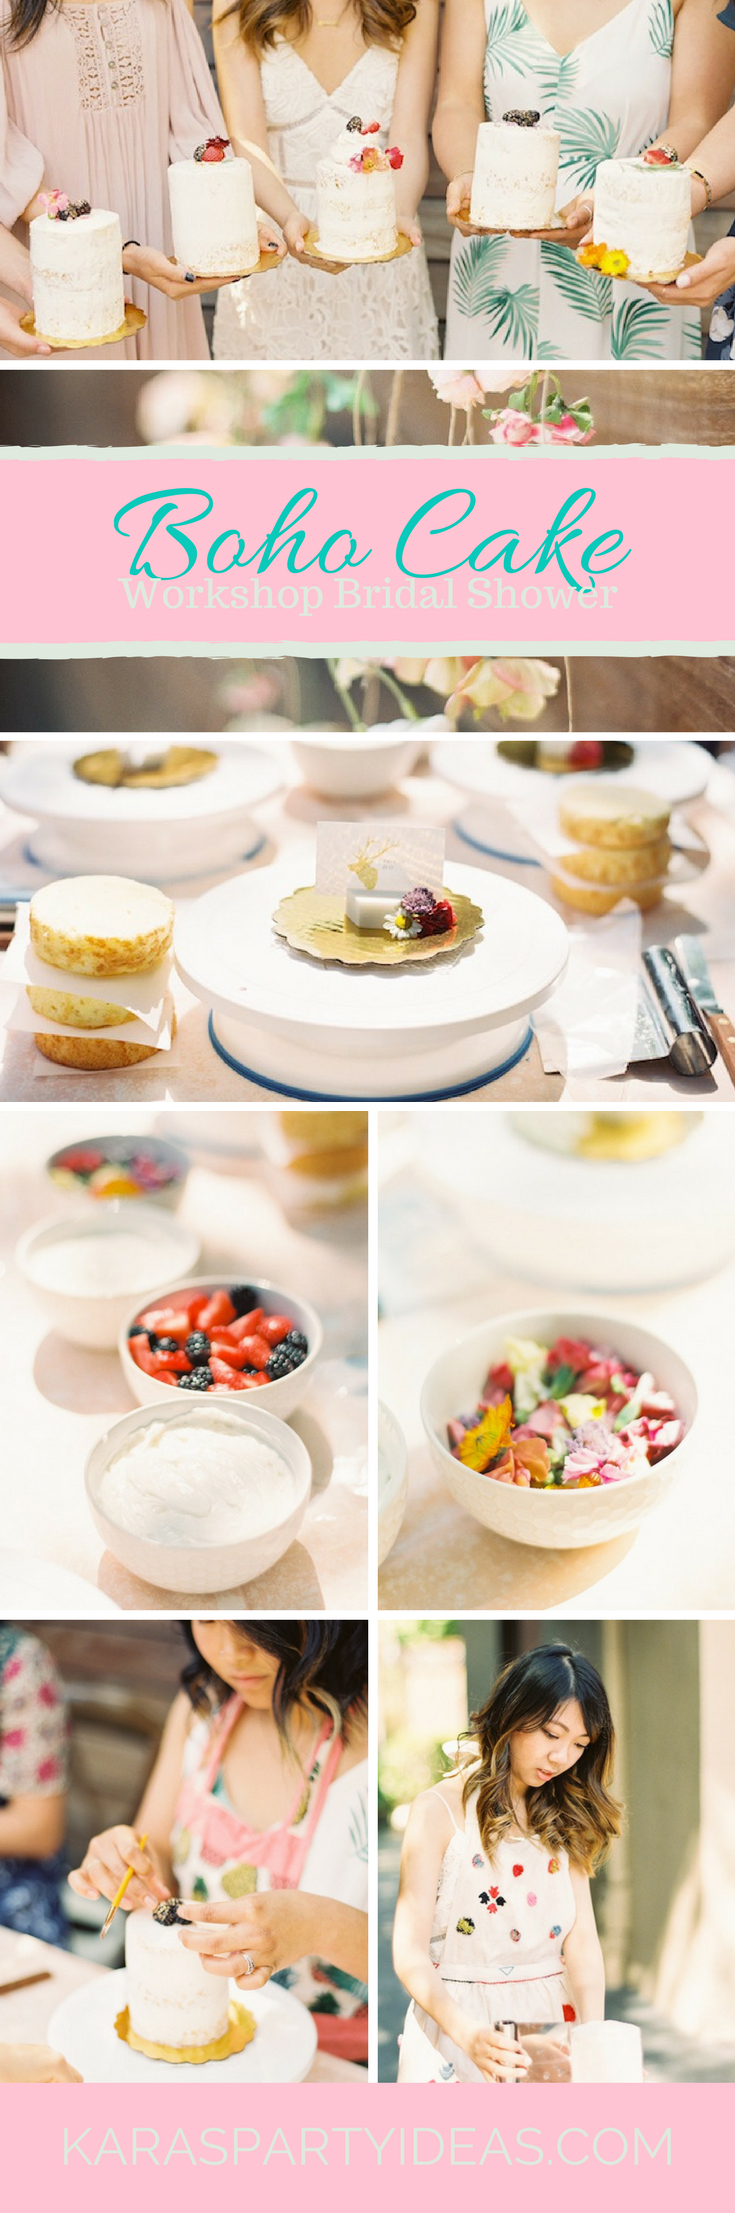 Boho Cake Workshop Bridal Shower via Kara's Party Ideas